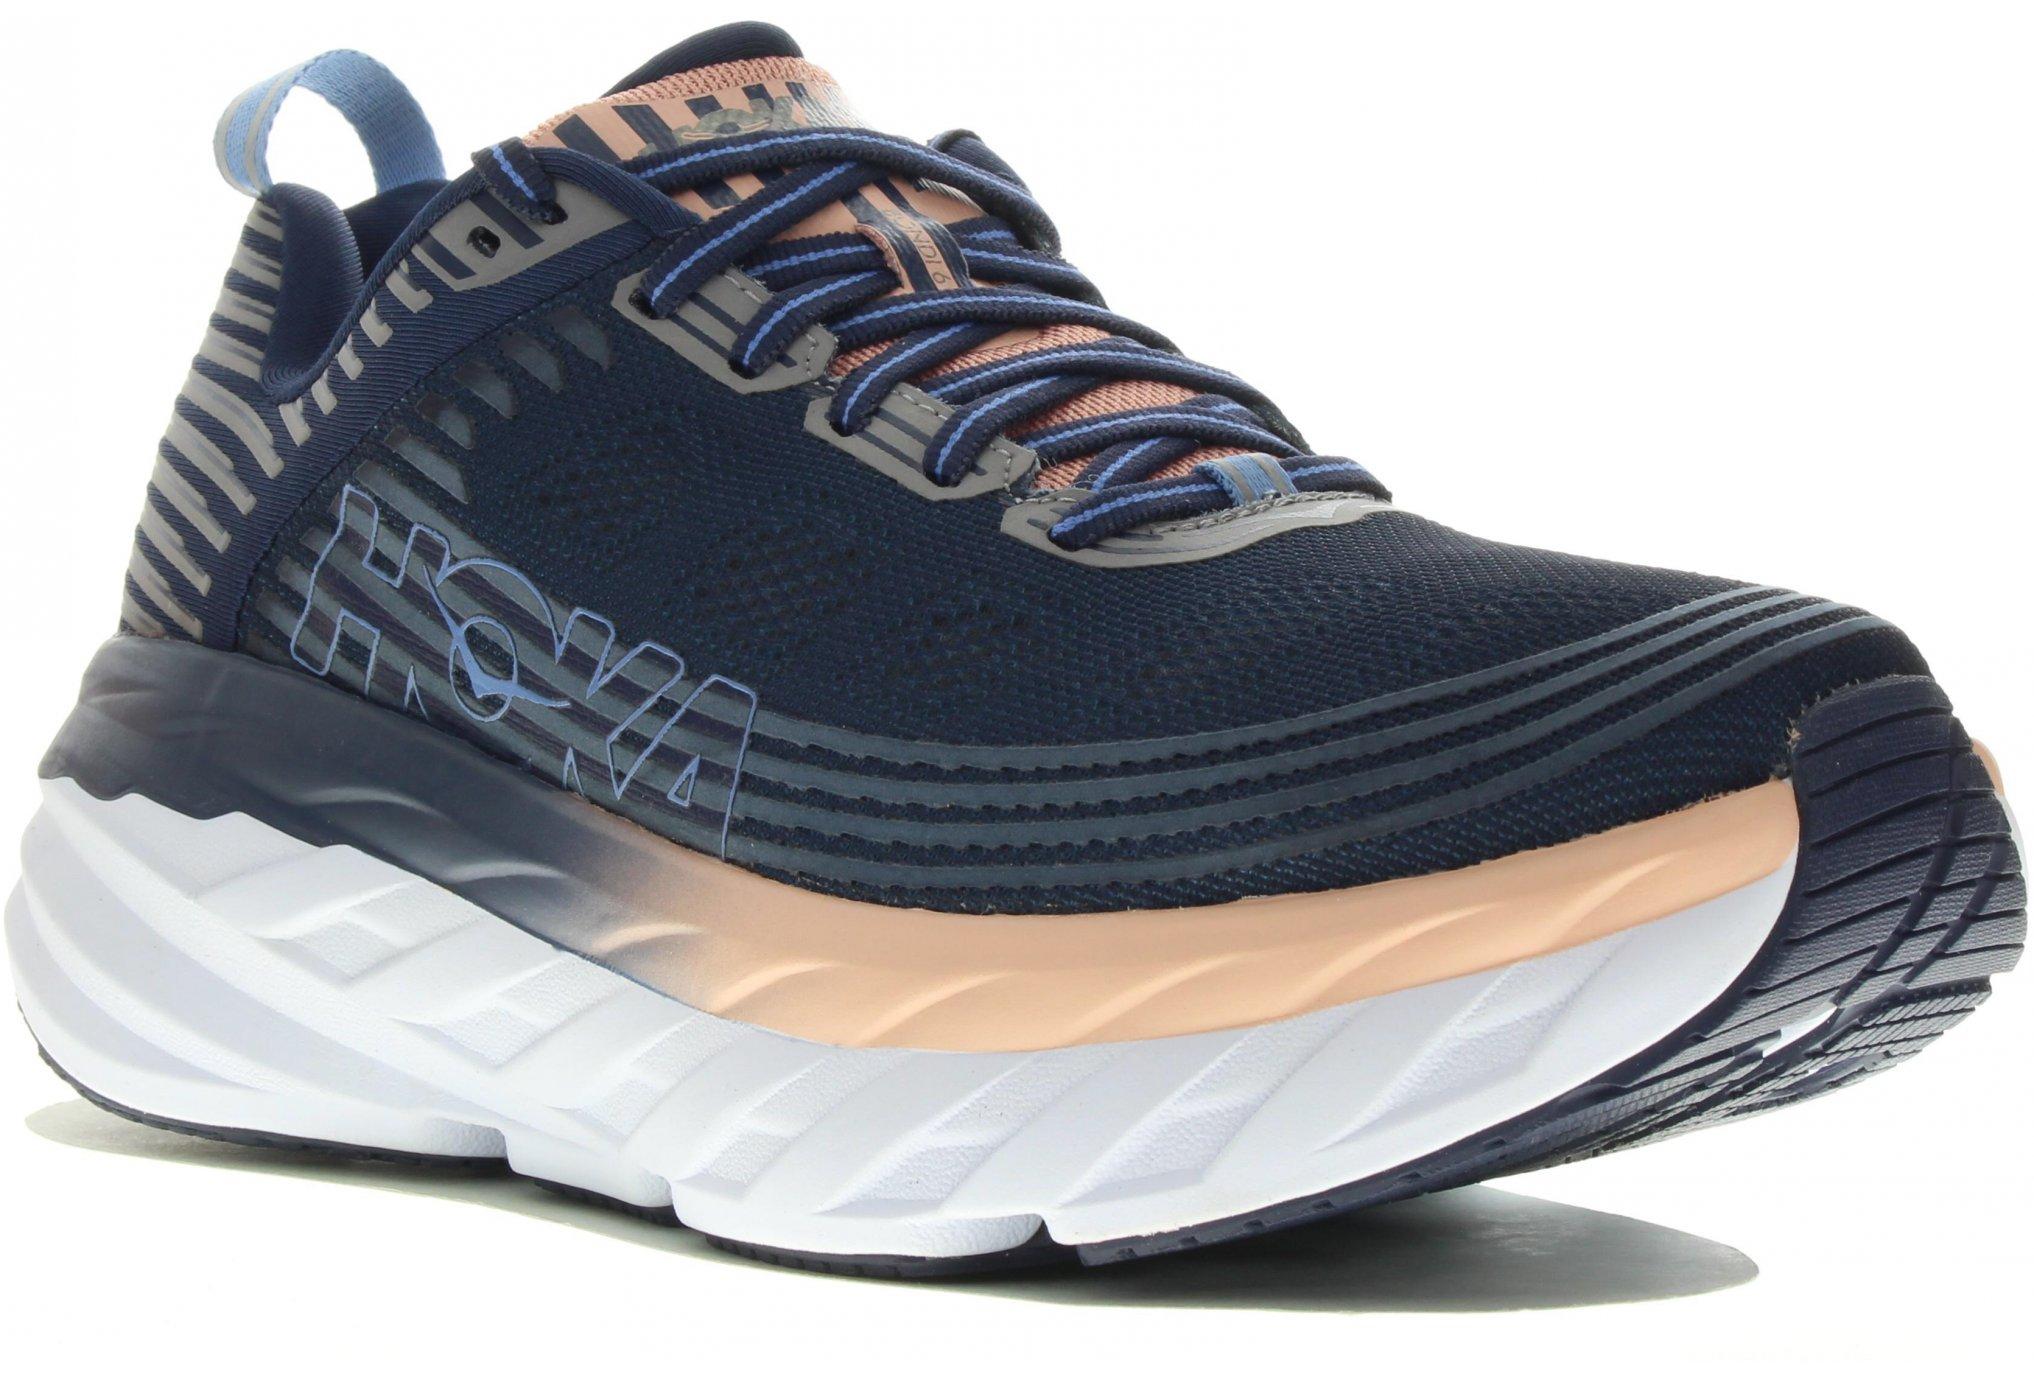 e6cf8769489fb Hoka One One Bondi 6 W Chaussures running femme